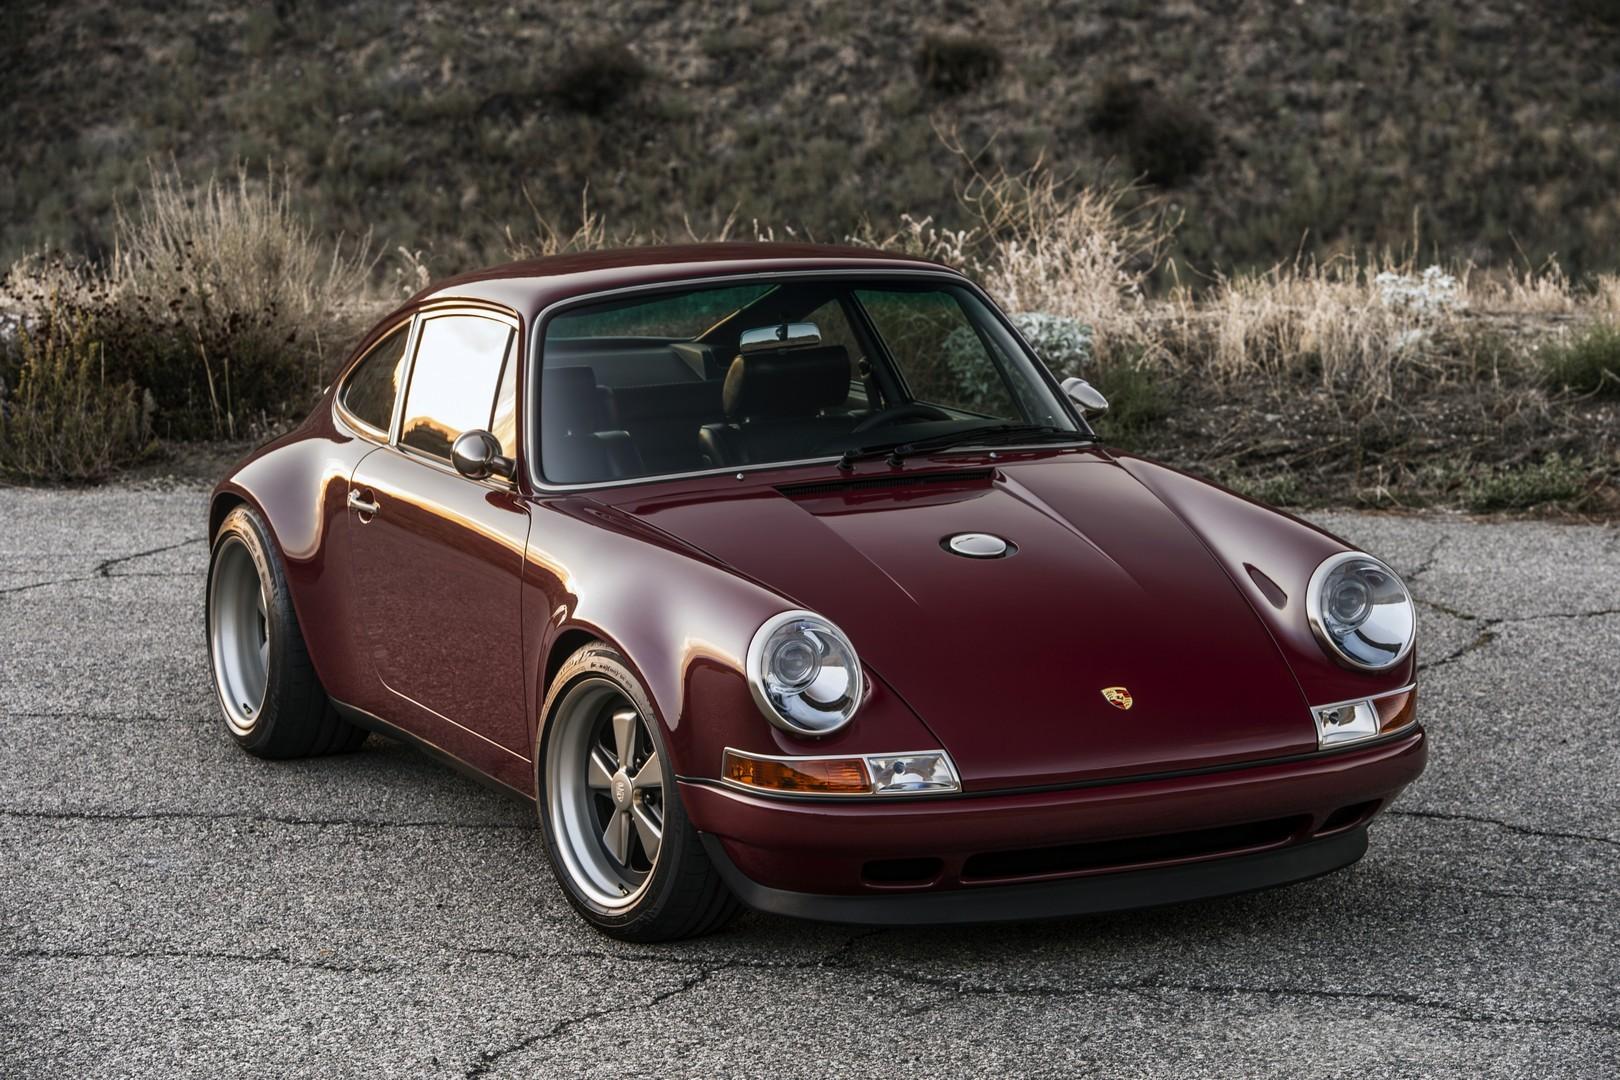 Craigslist Dc Cars >> Singer Porsche 911 Duo Is Restomod Coolness - autoevolution